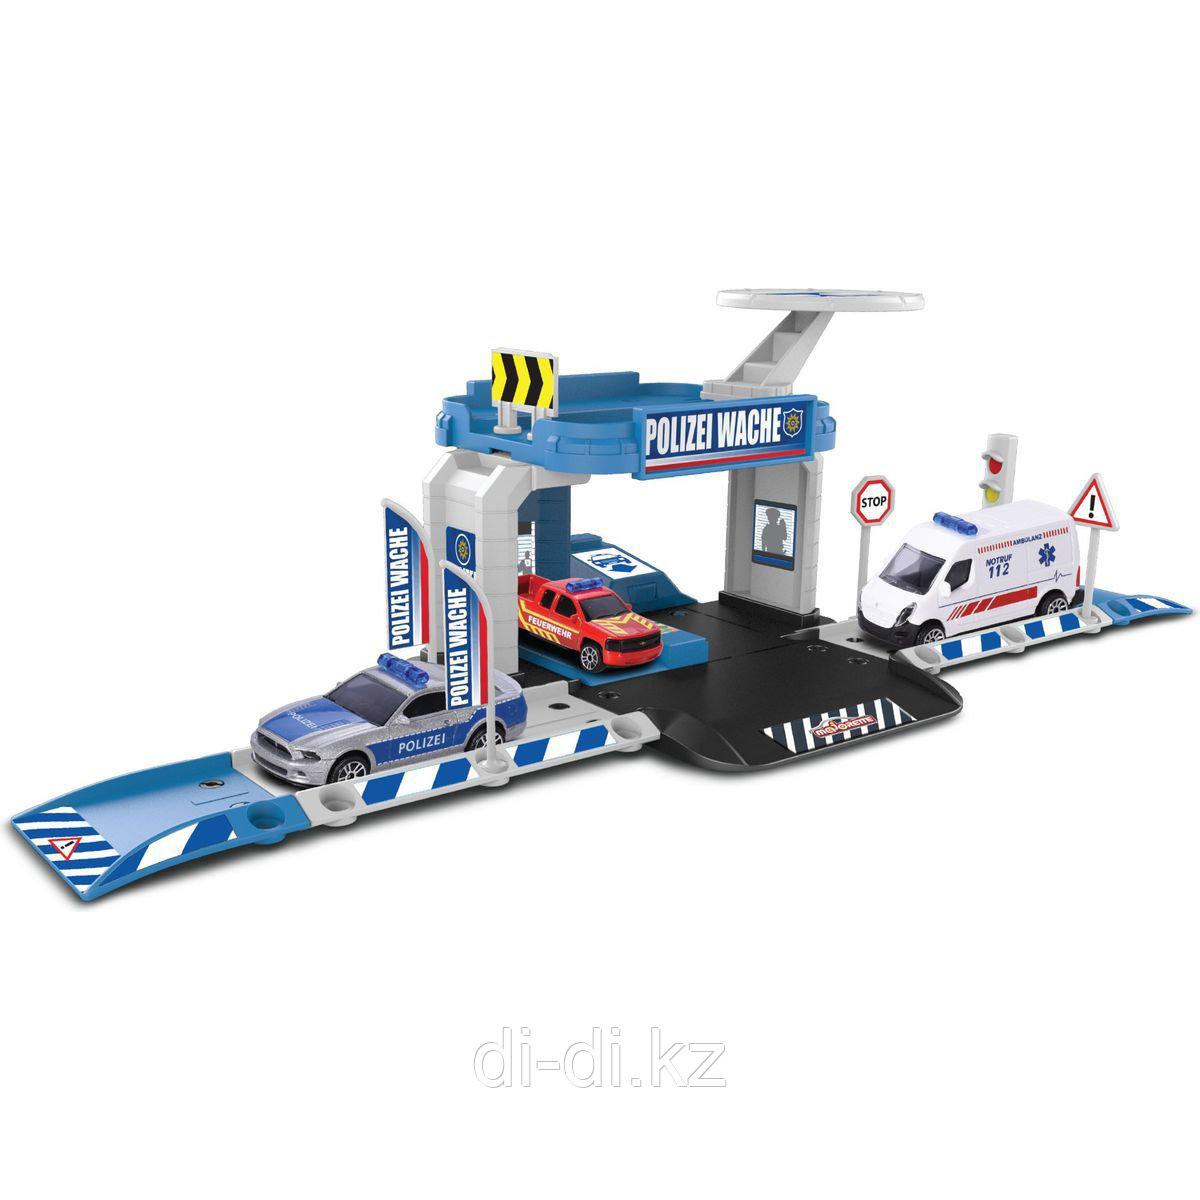 Dickie Toys Парковка базовая Creatix Полиция с машинкой Majorette 2050001